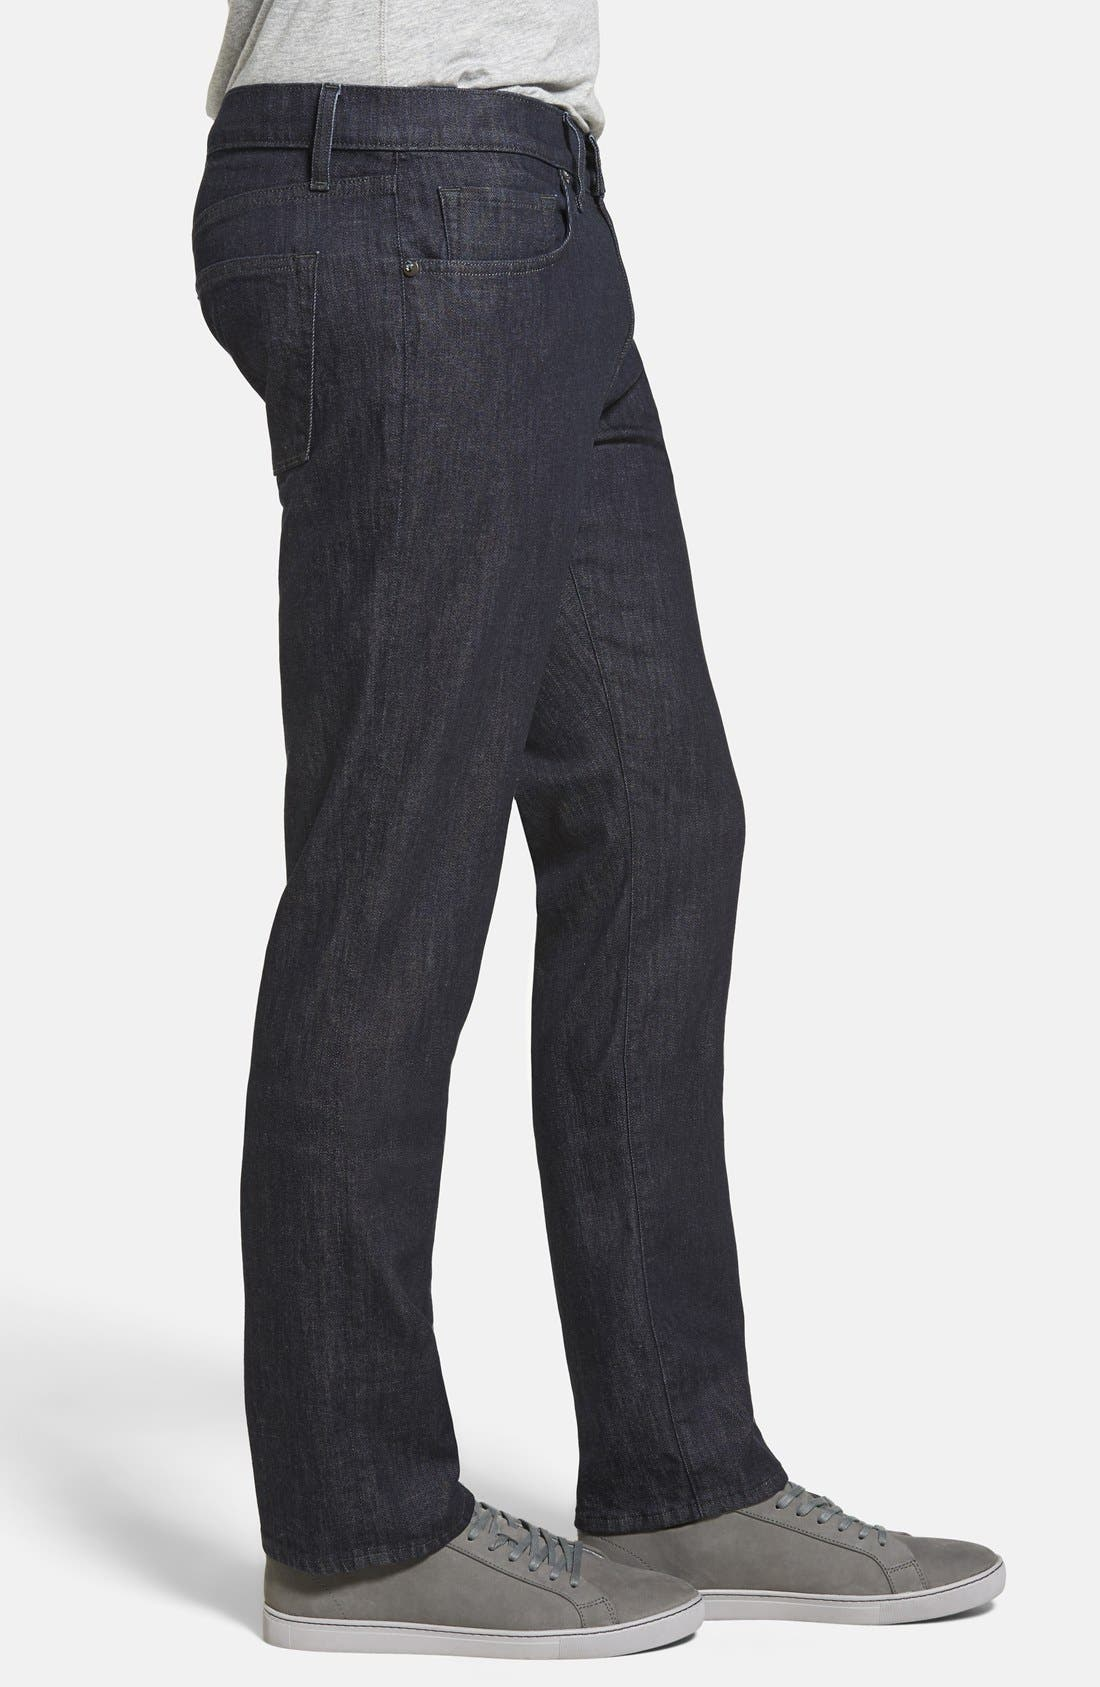 Kane Slim Straight Leg Jeans,                             Alternate thumbnail 5, color,                             HIRSCH